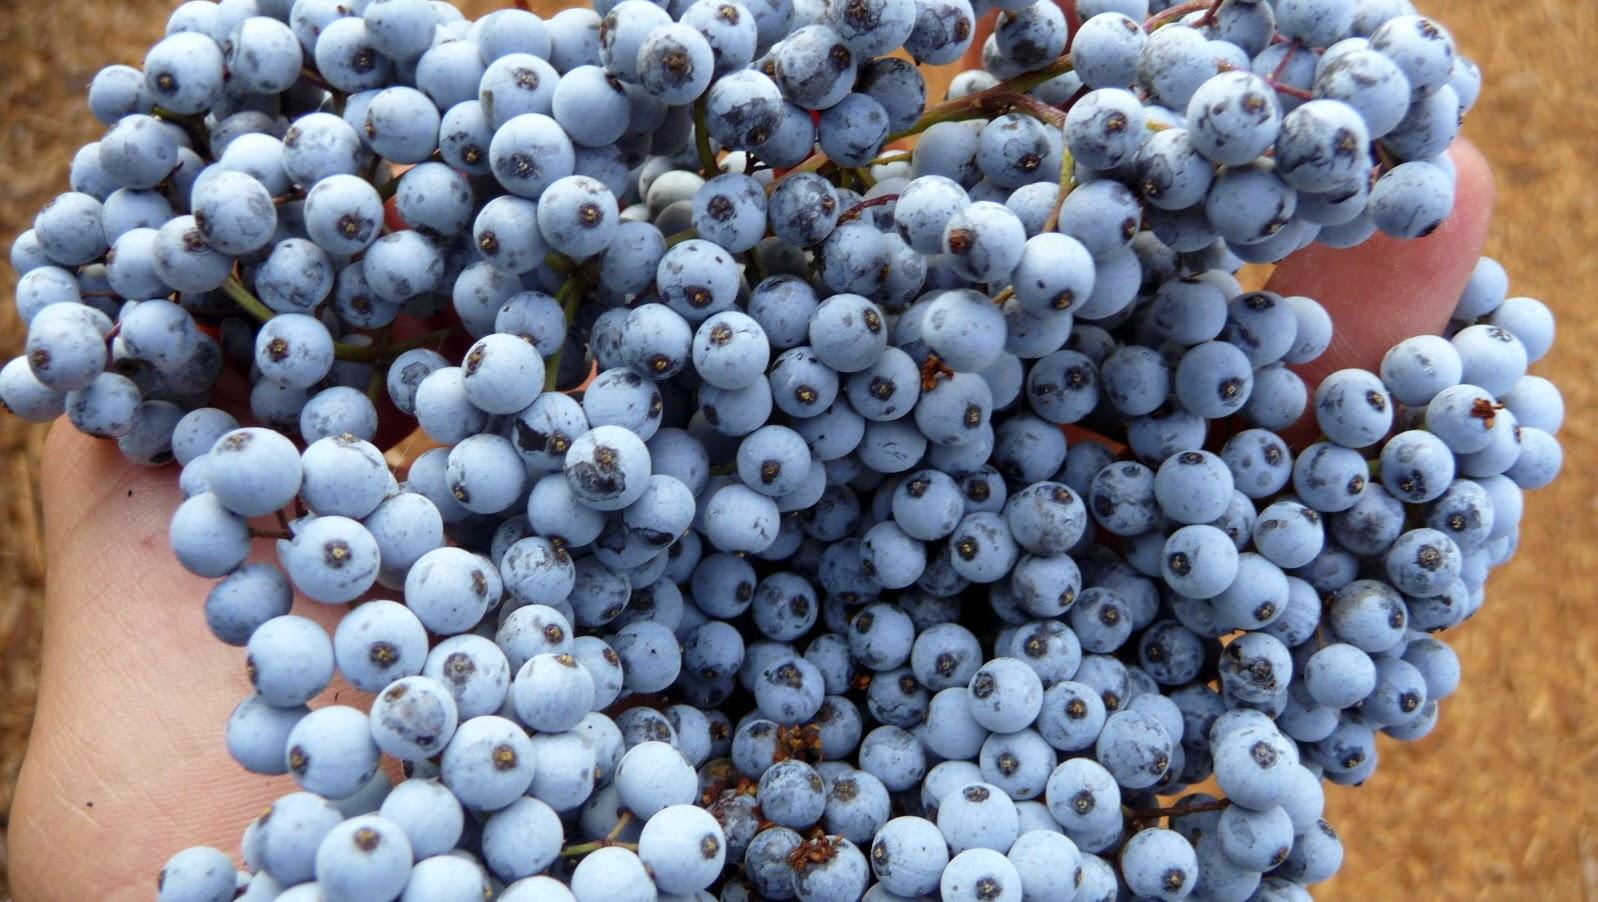 Eldelberrie: Makanan - Makanan Lezat Yang Beracun